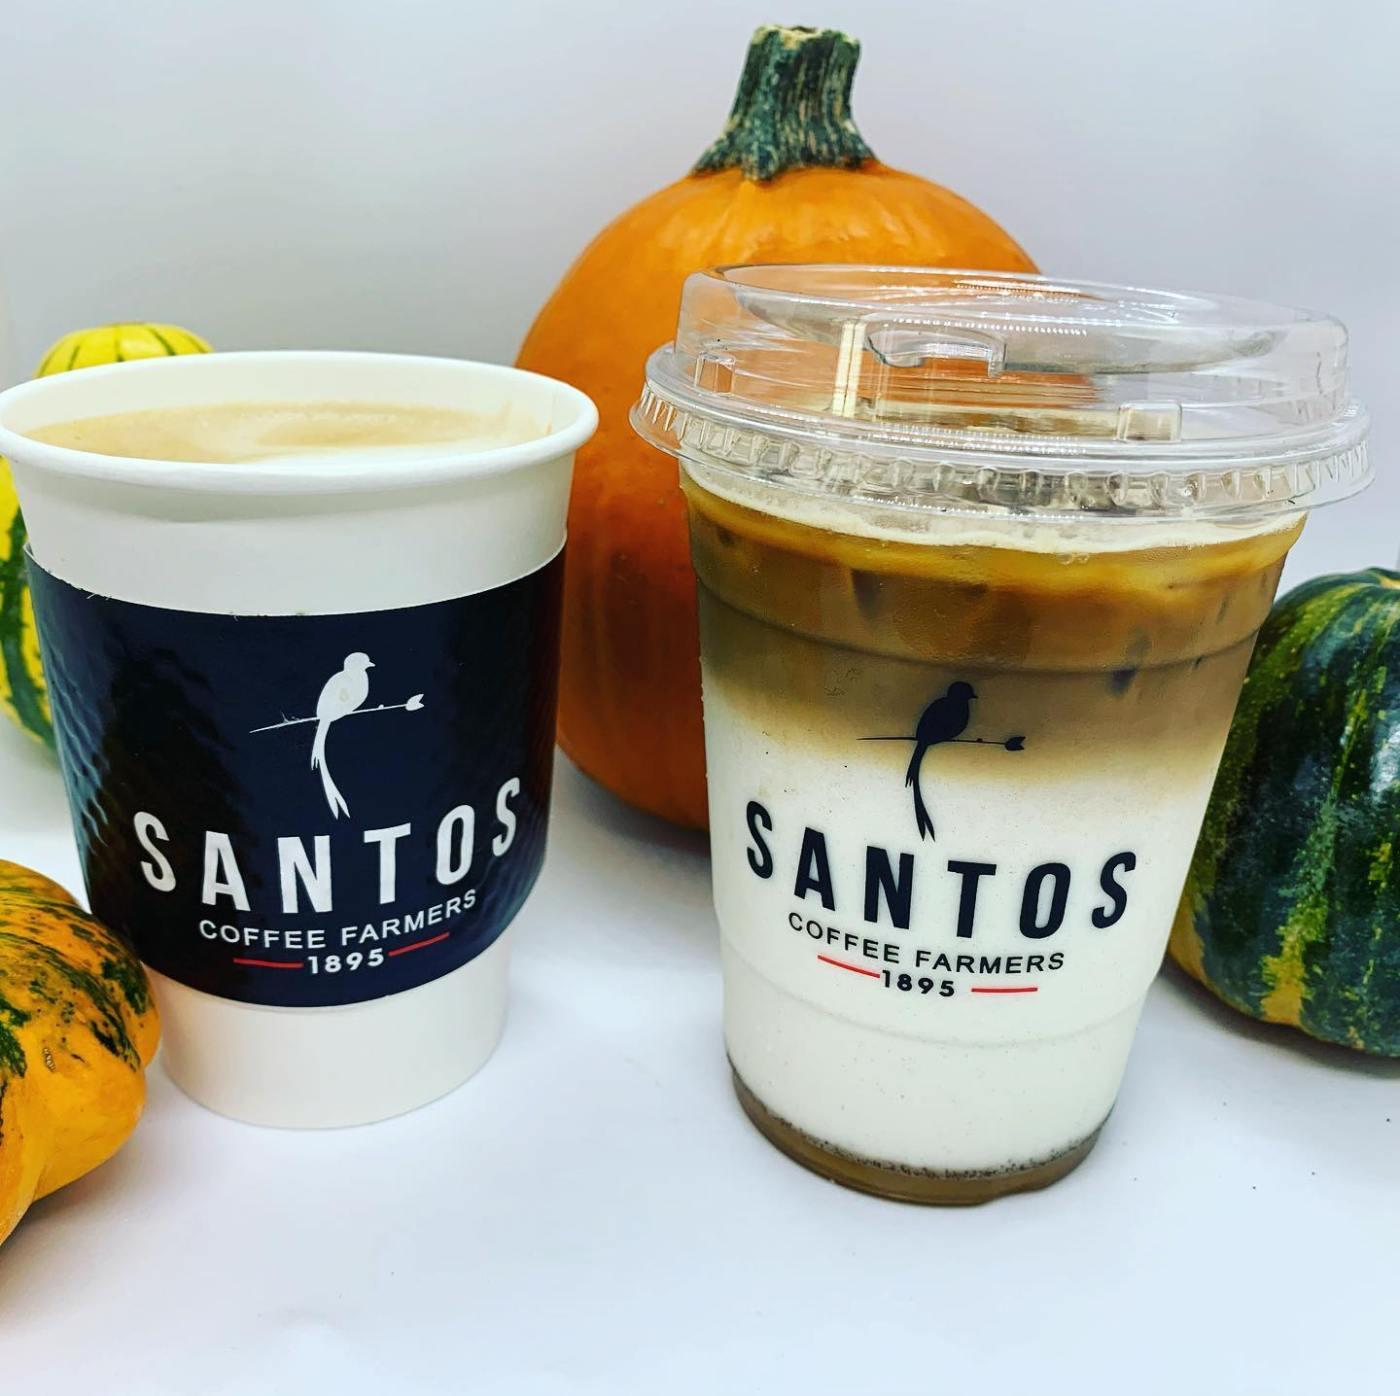 Hot coffee drink, iced coffee drink, and mini pumpkins at Santos - Birmingham coffee shops